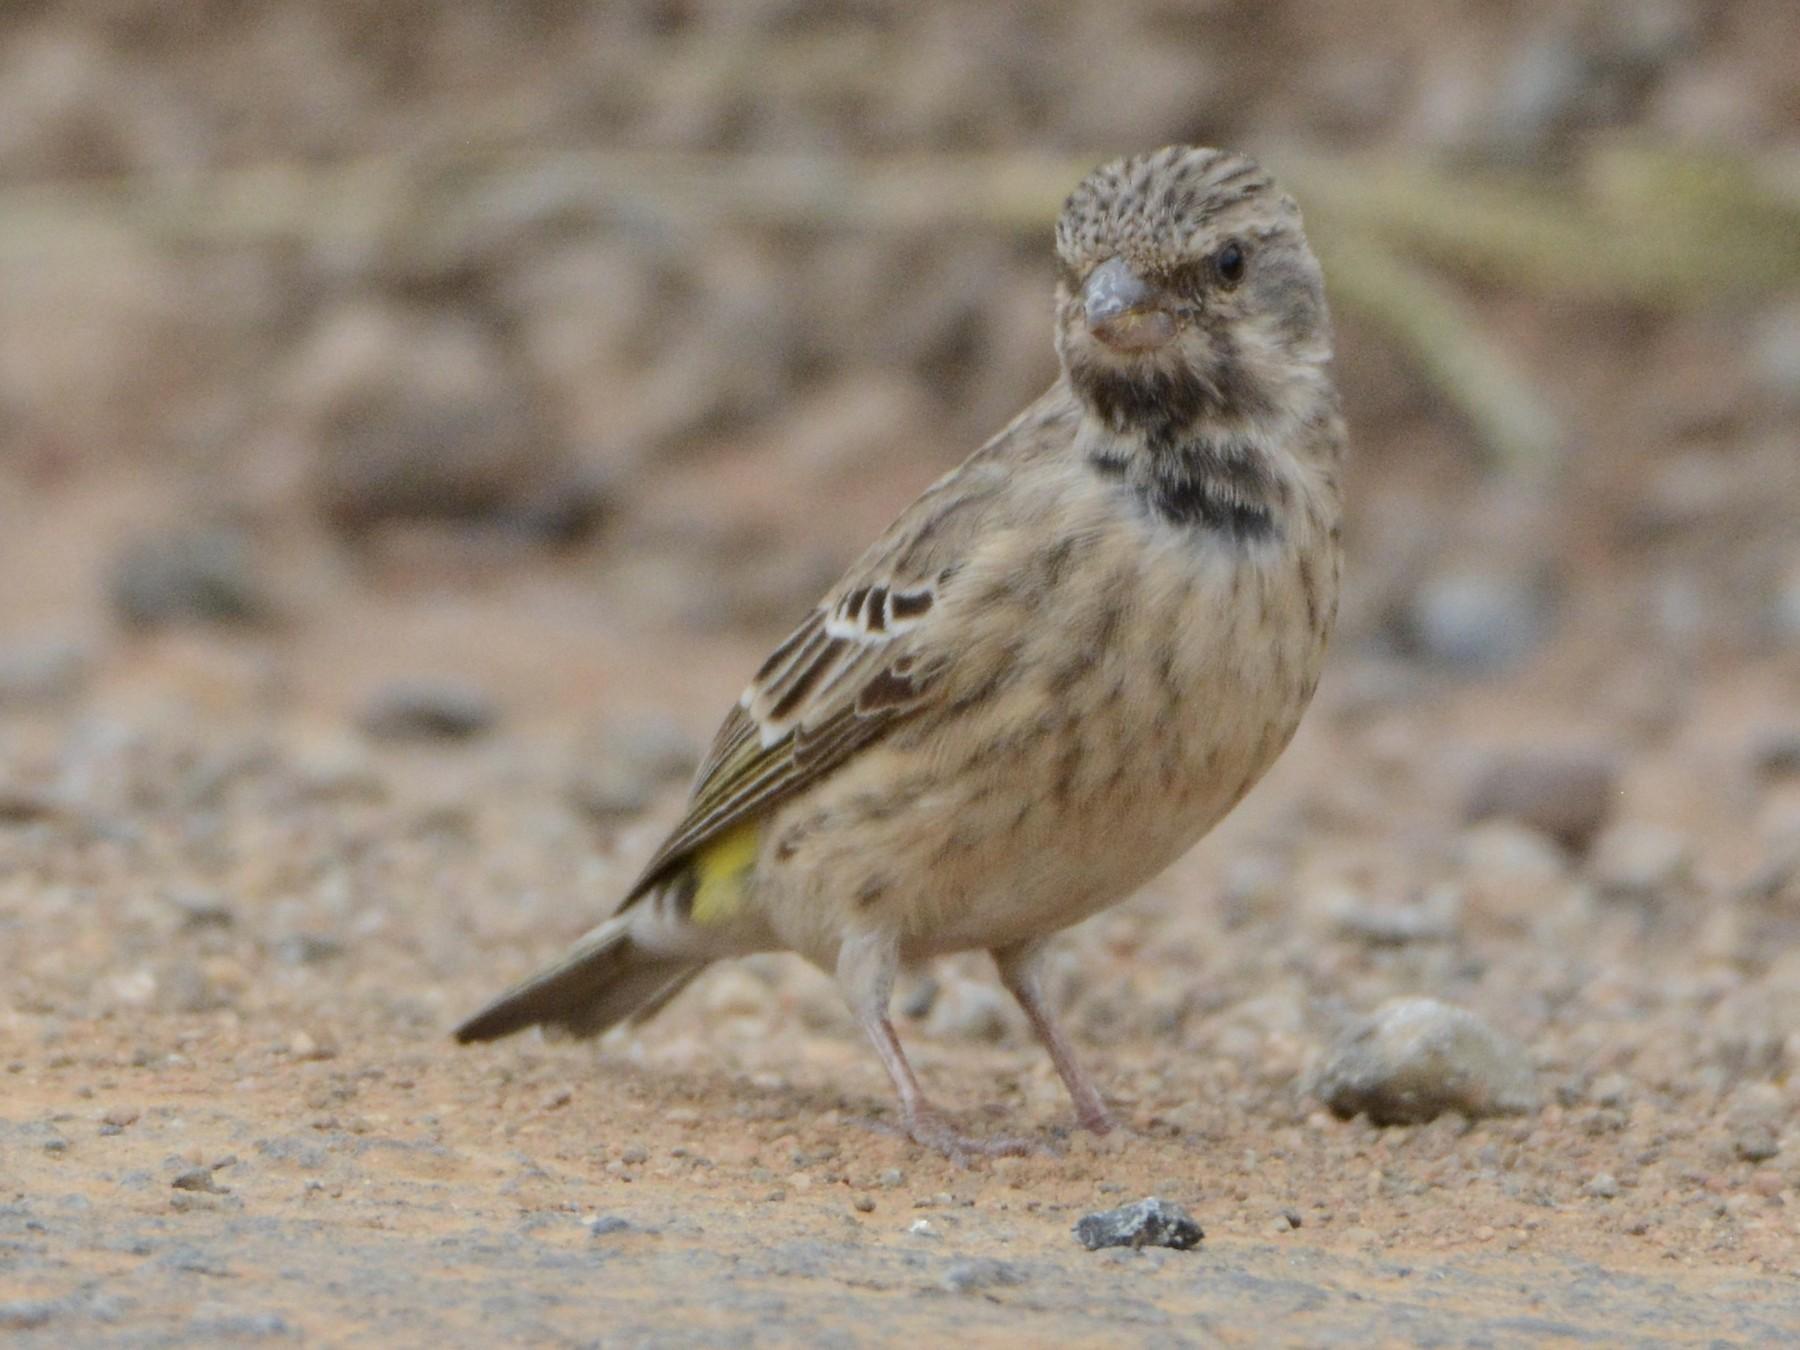 Black-throated Canary - Taylor Abbott